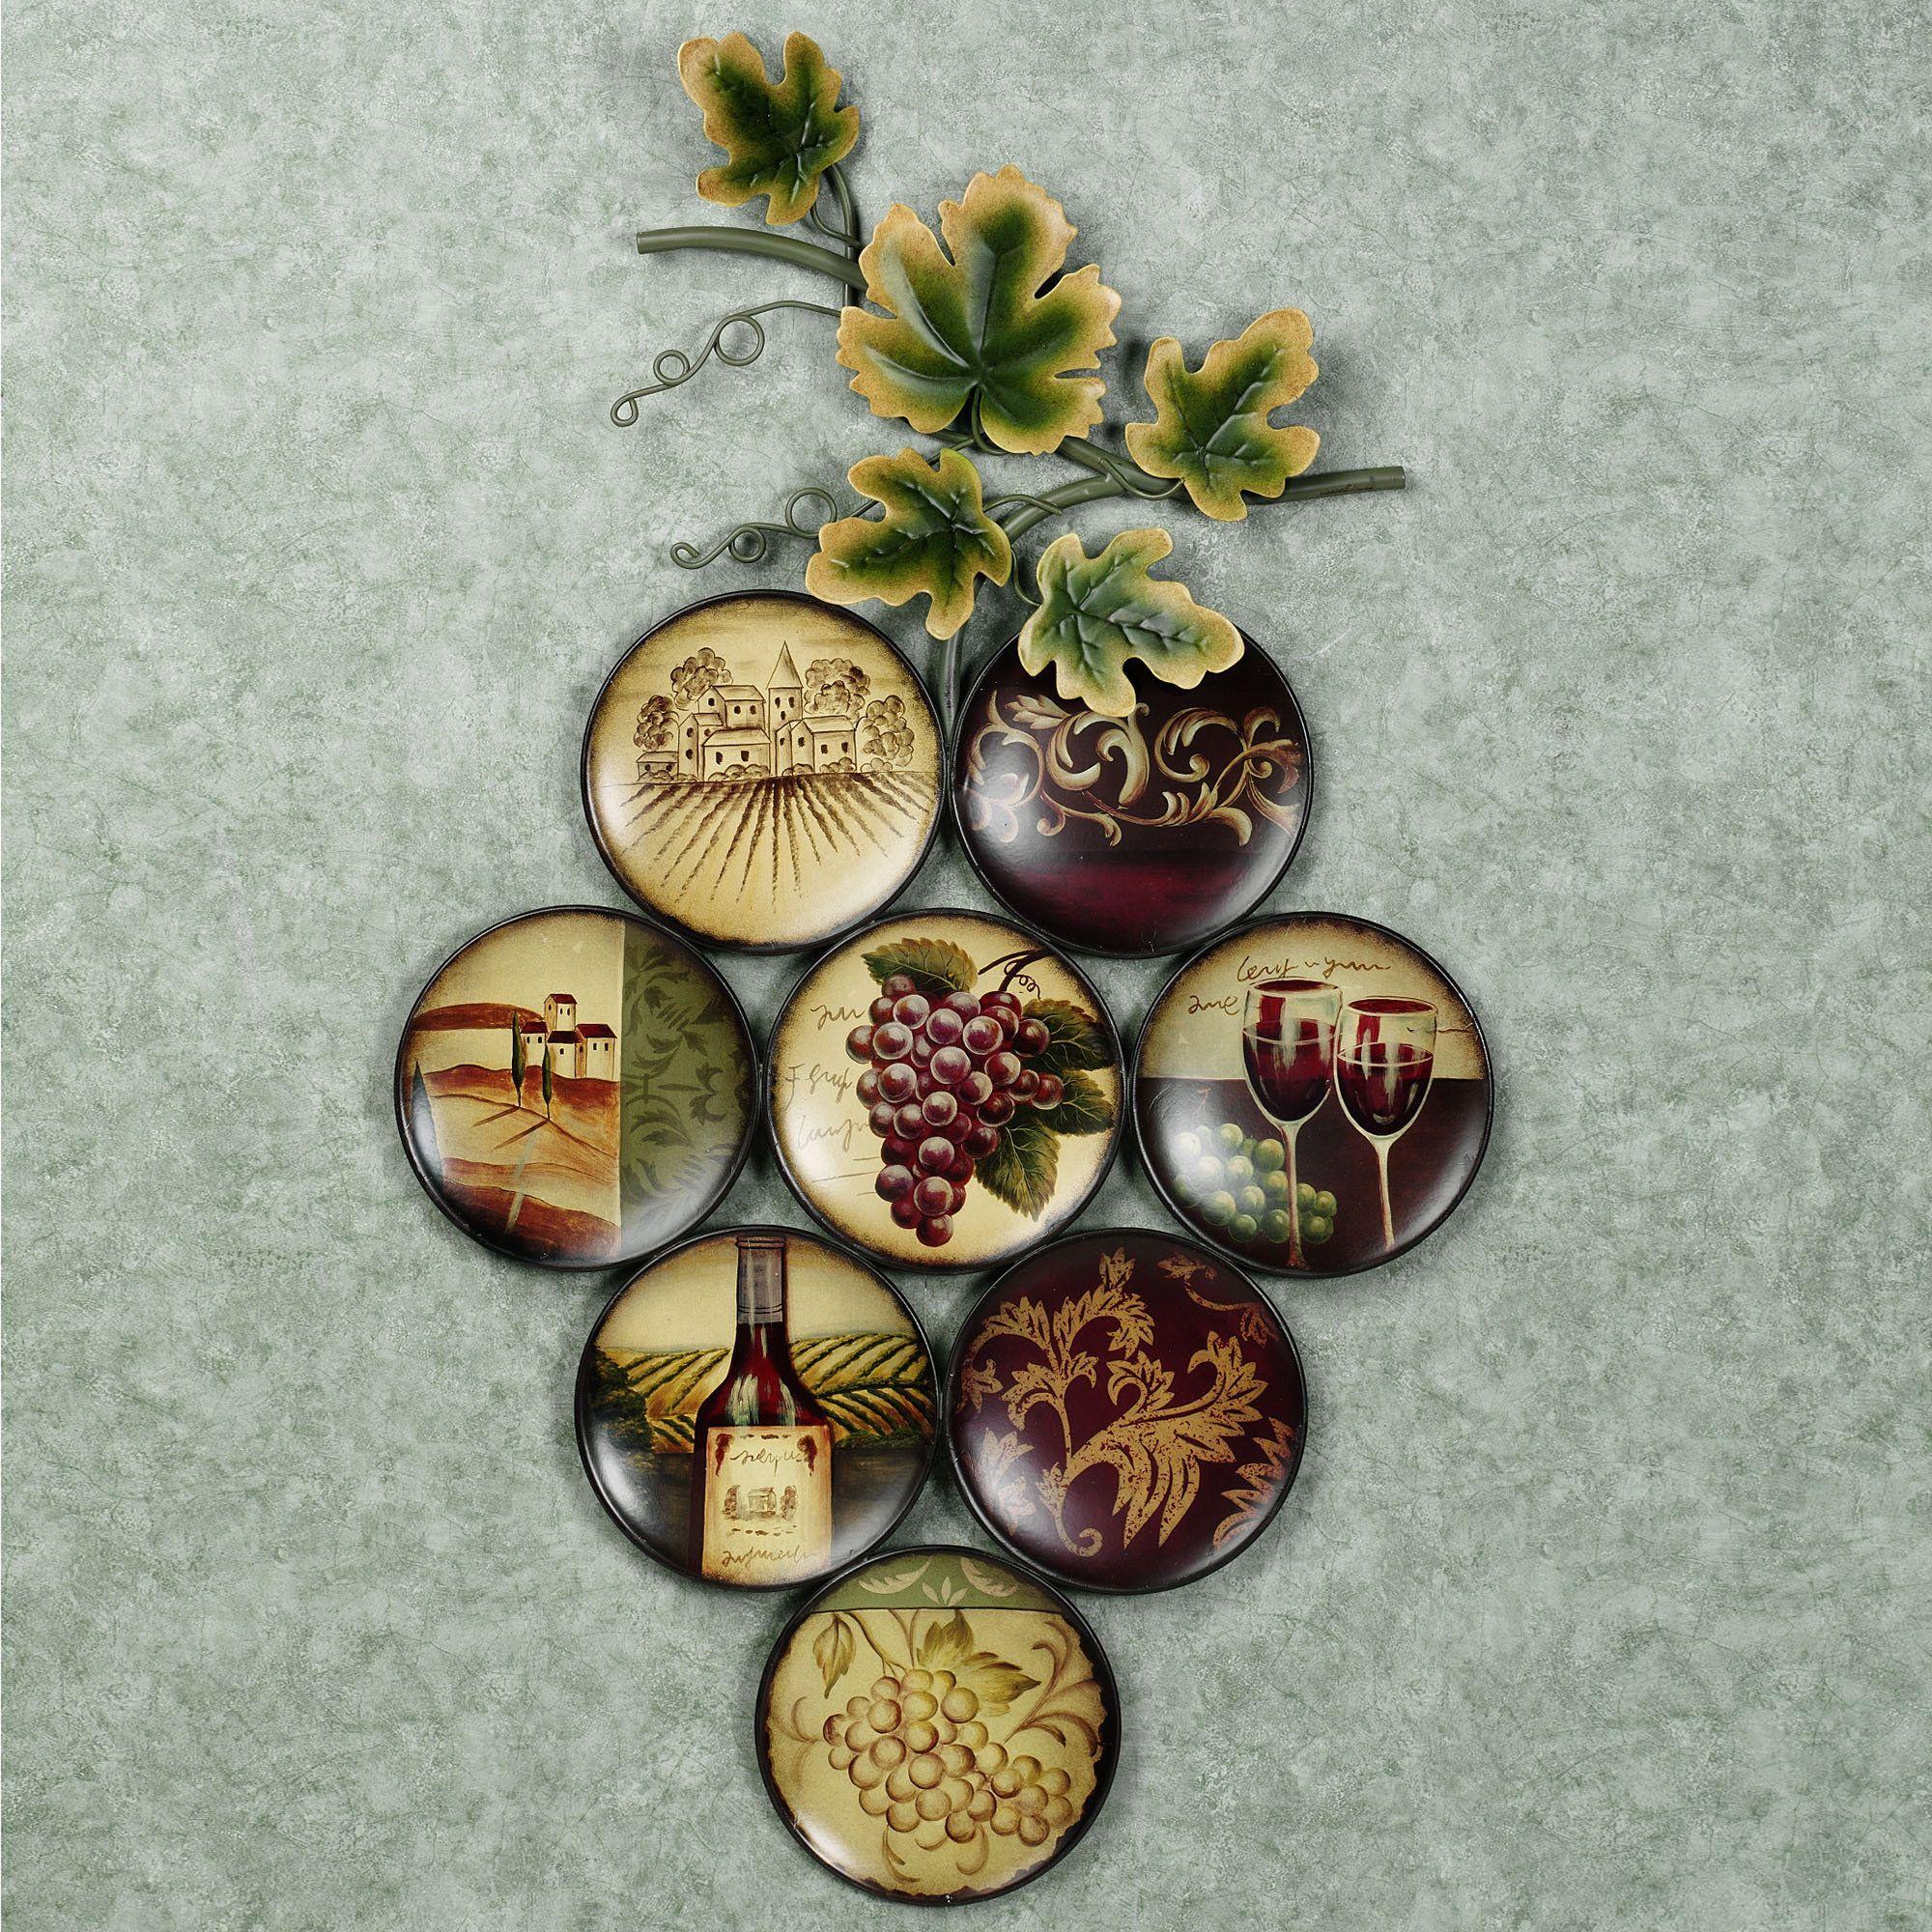 Spirito di vino wall artmulti jewel decorating ideas pinterest